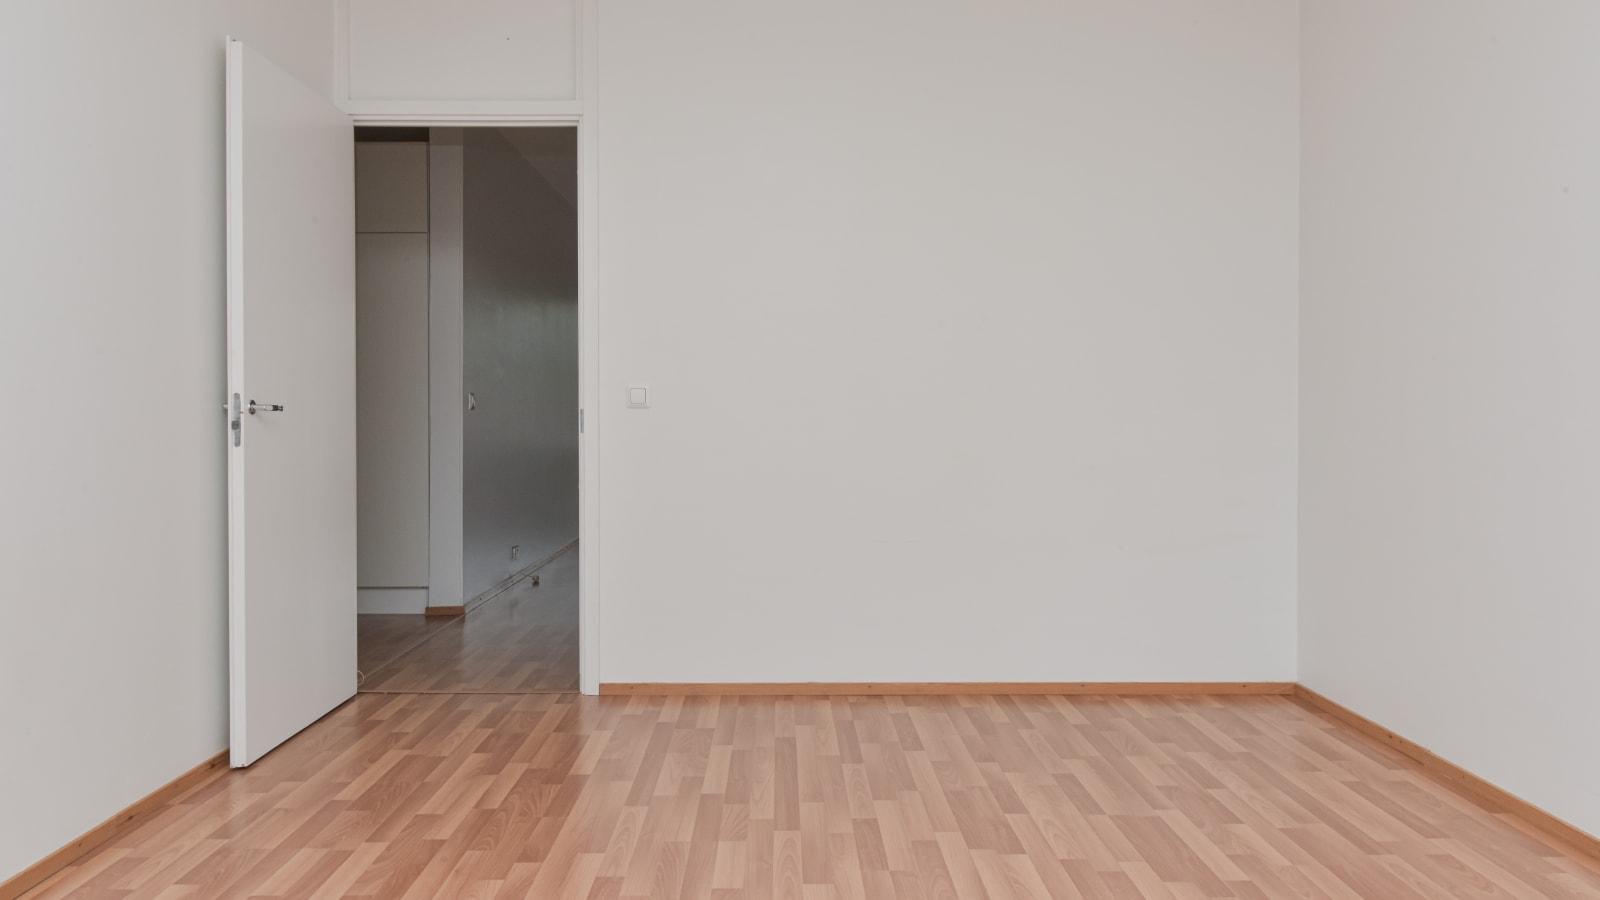 Espoo, Laajalahti, Heinjoenpolku 2 K-O